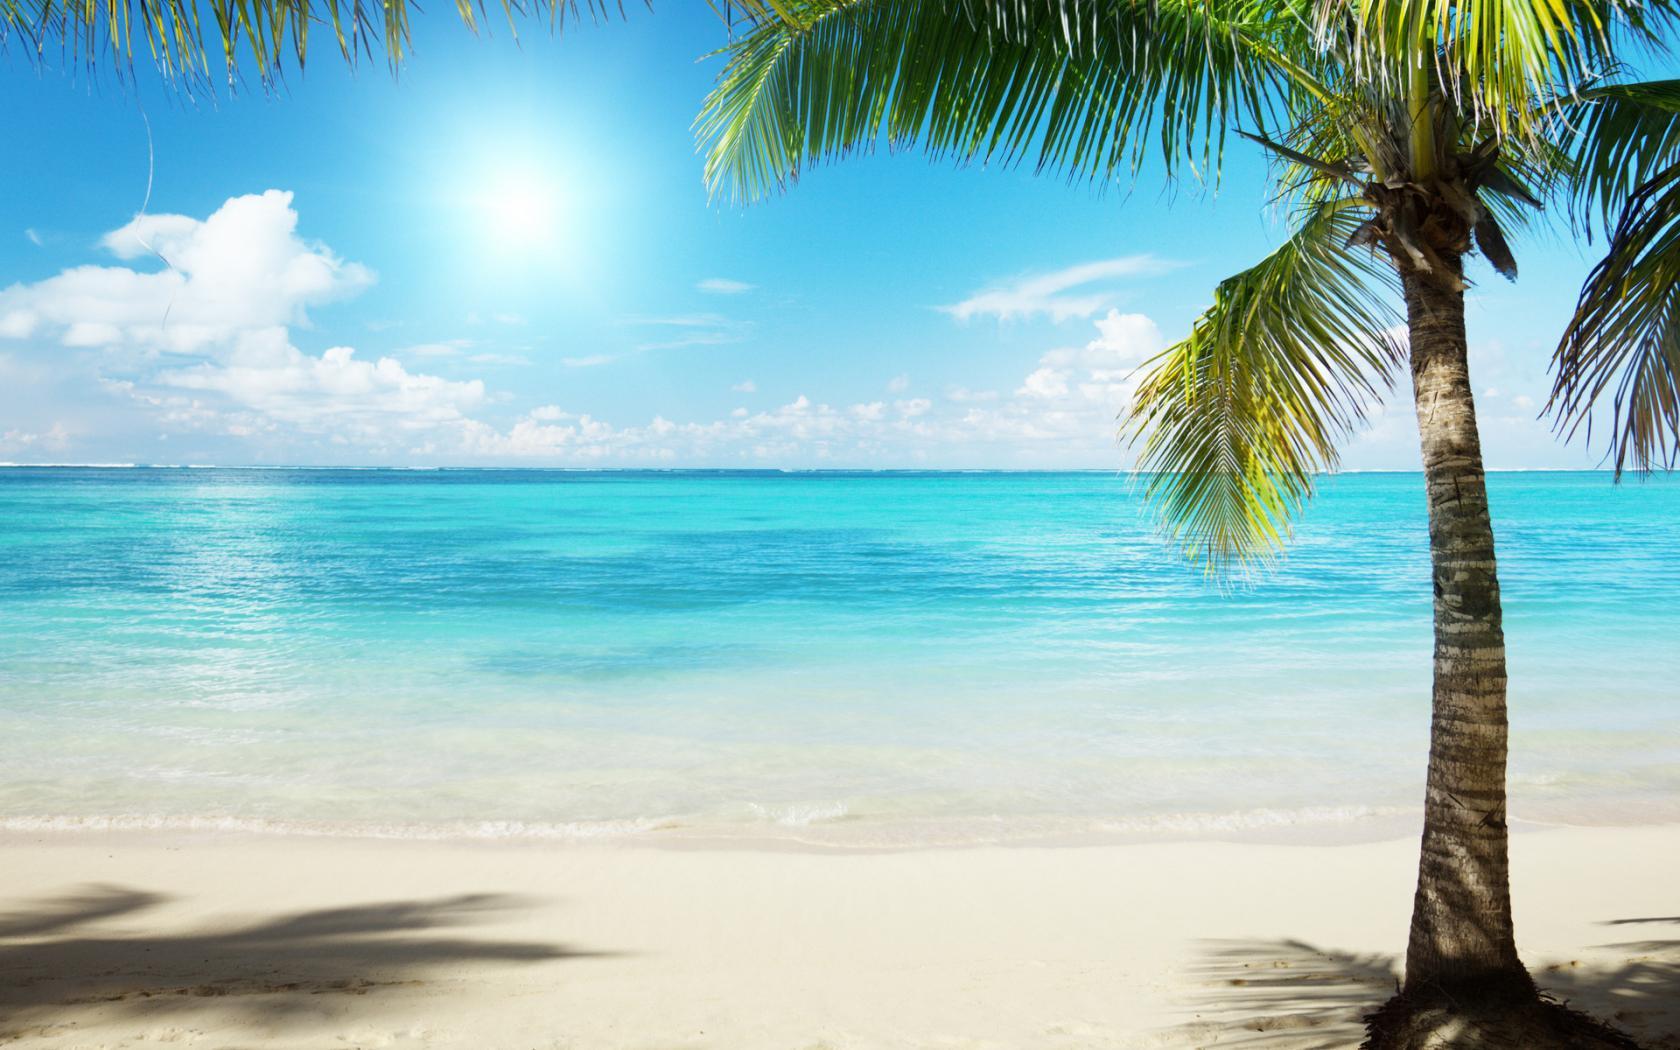 океан солнце фото